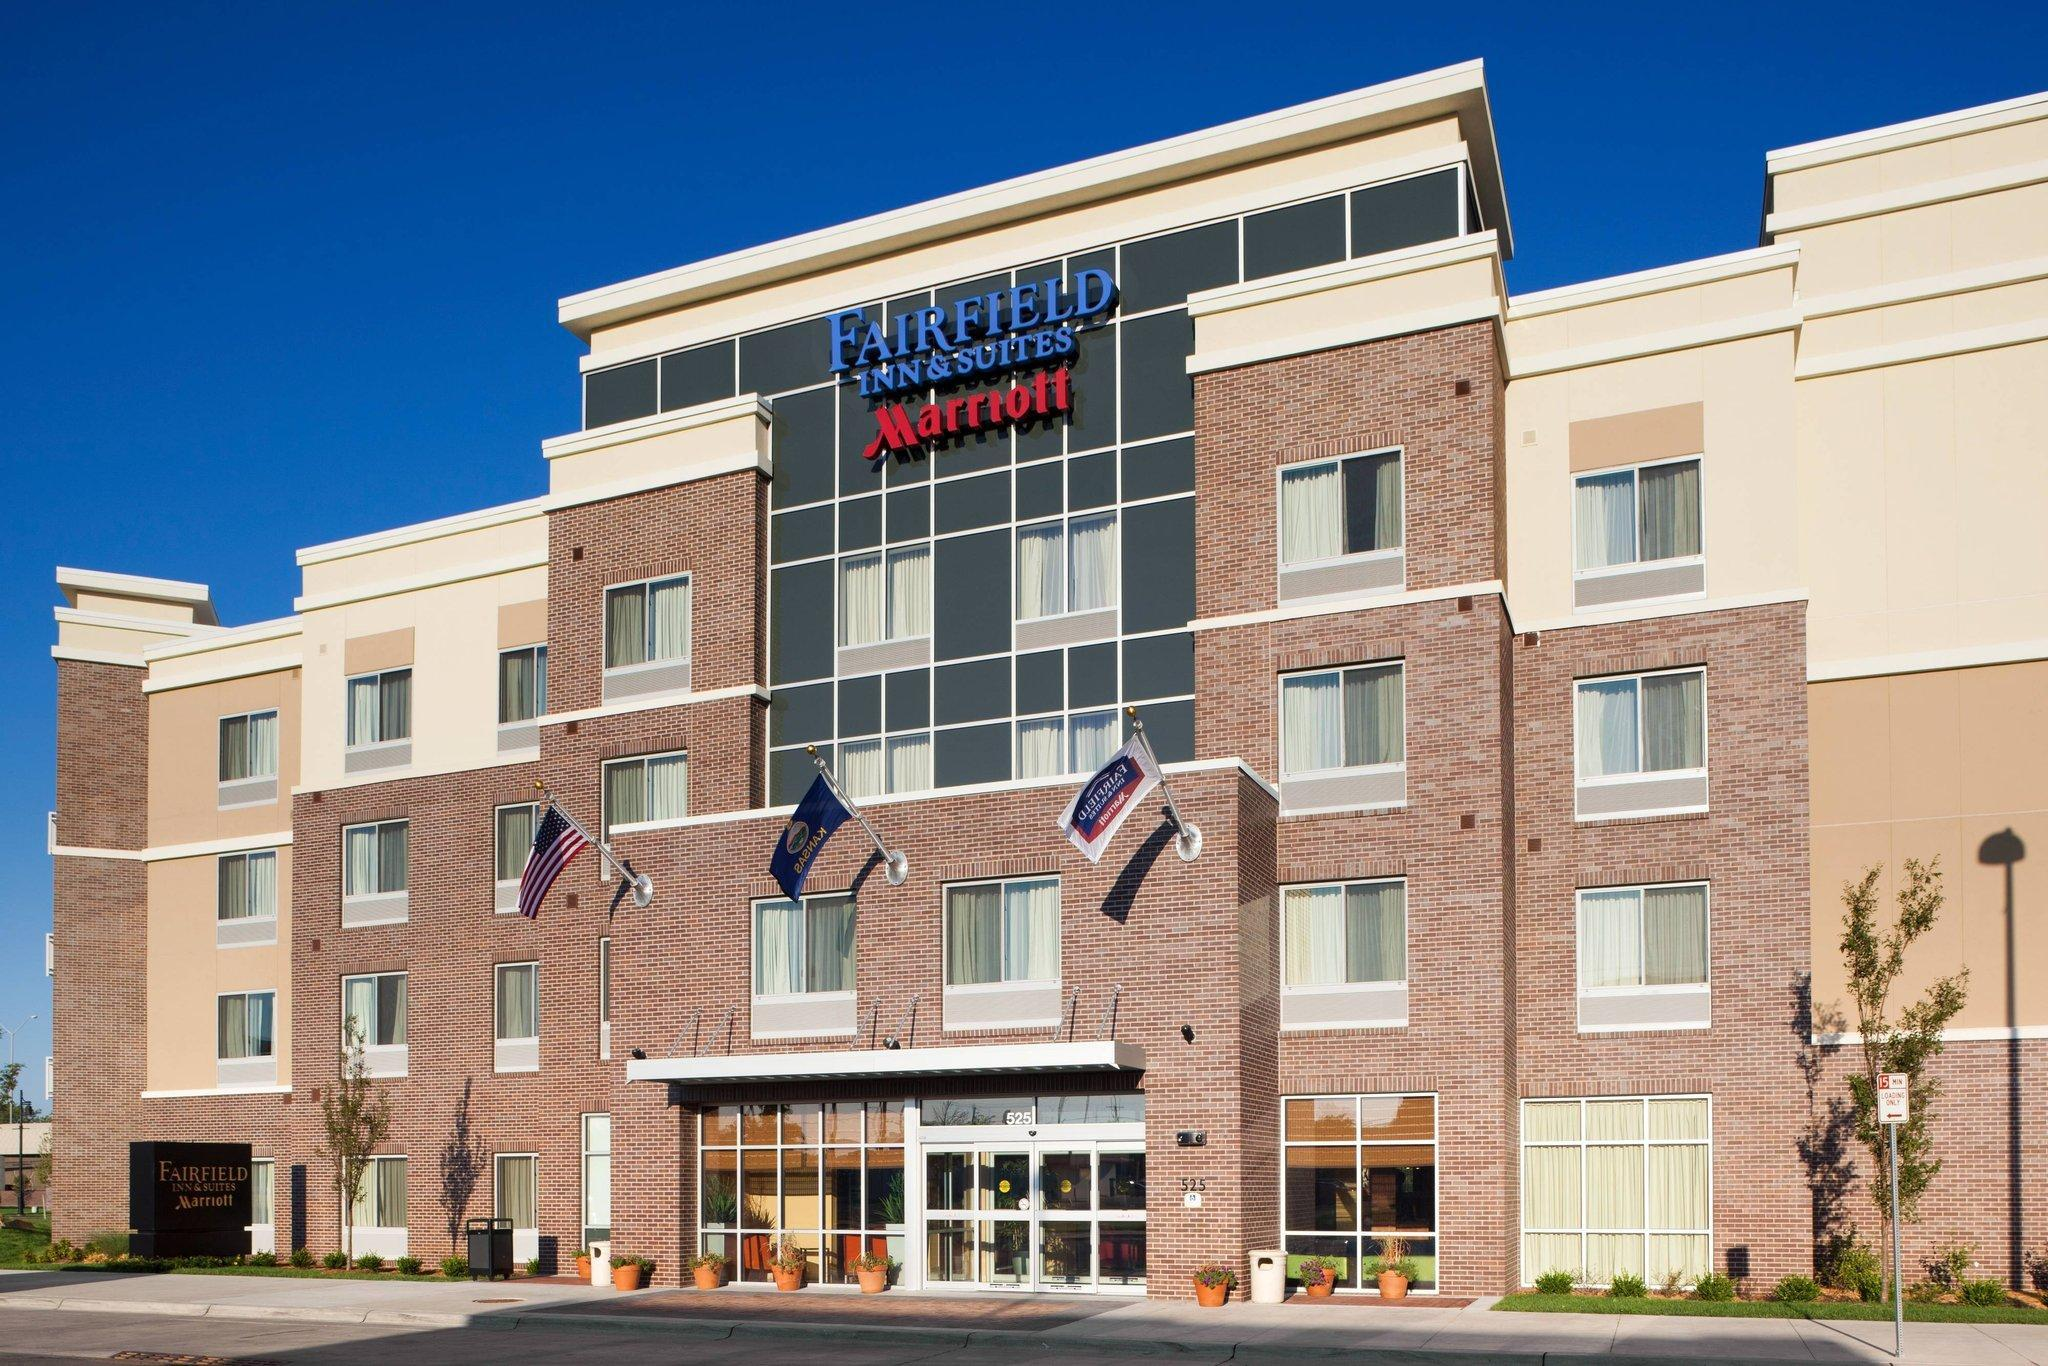 Fairfield Inn And Suites Wichita Downtown